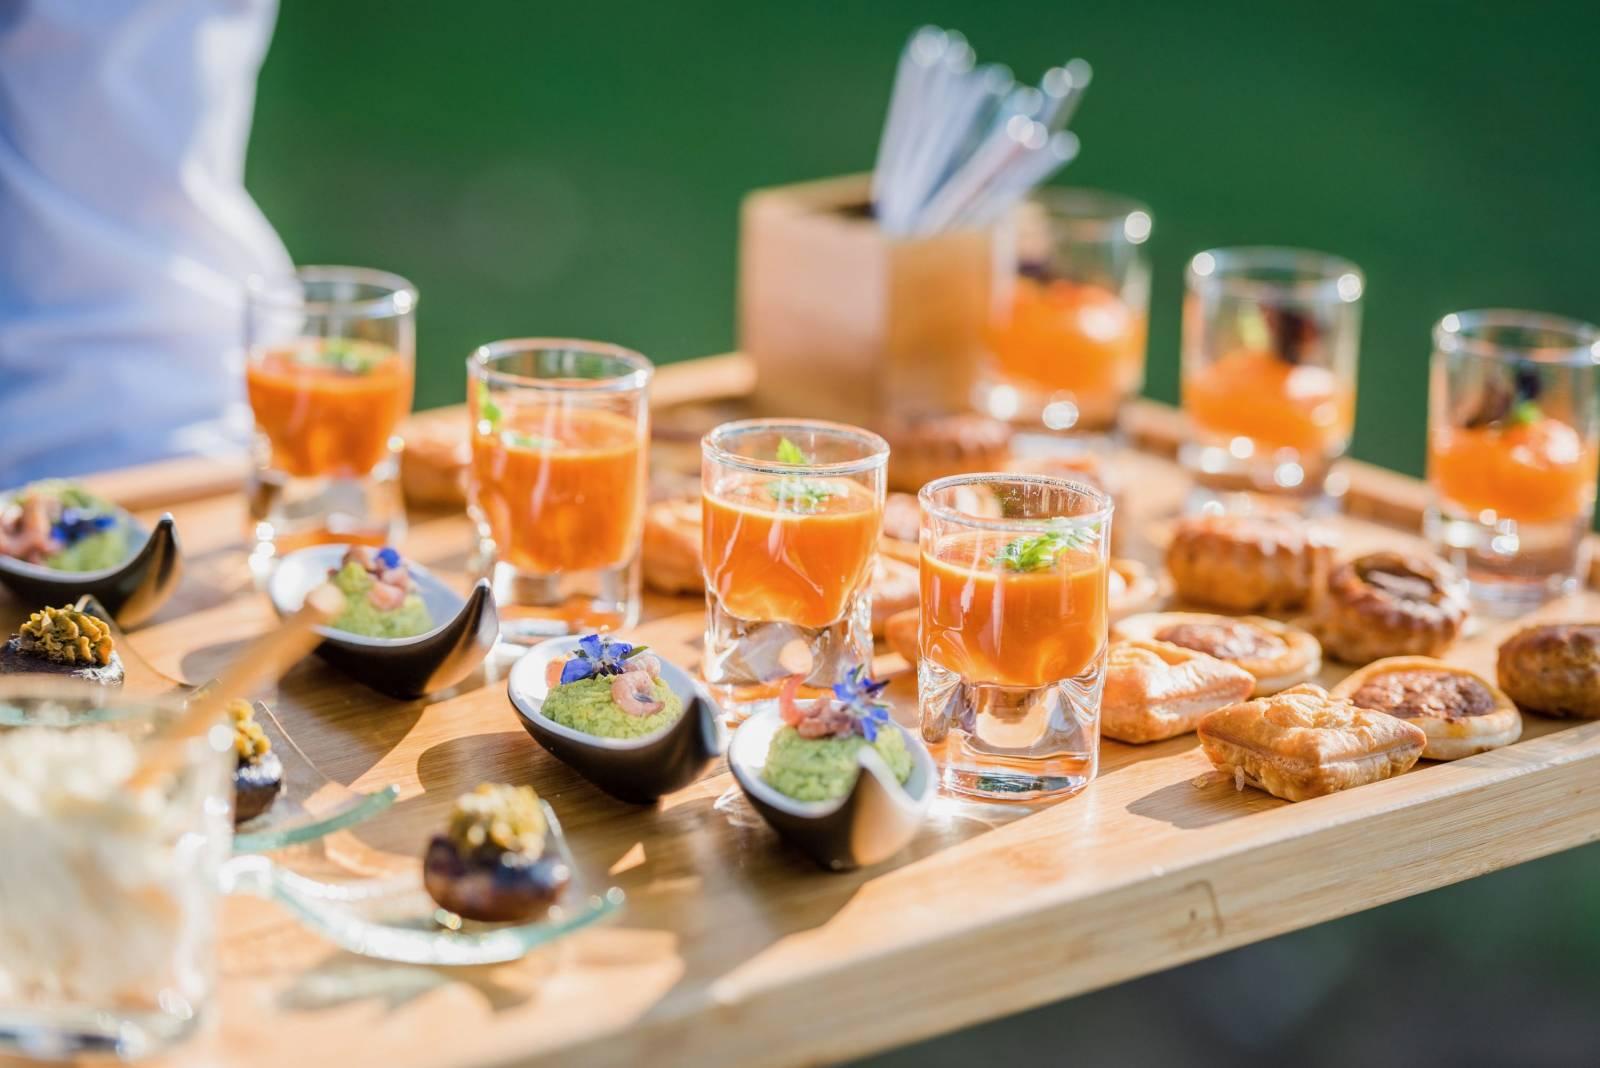 Omslag - Biorganic - Catering - Cateraar - Traiteur - Biologisch - House of Weddings - 10